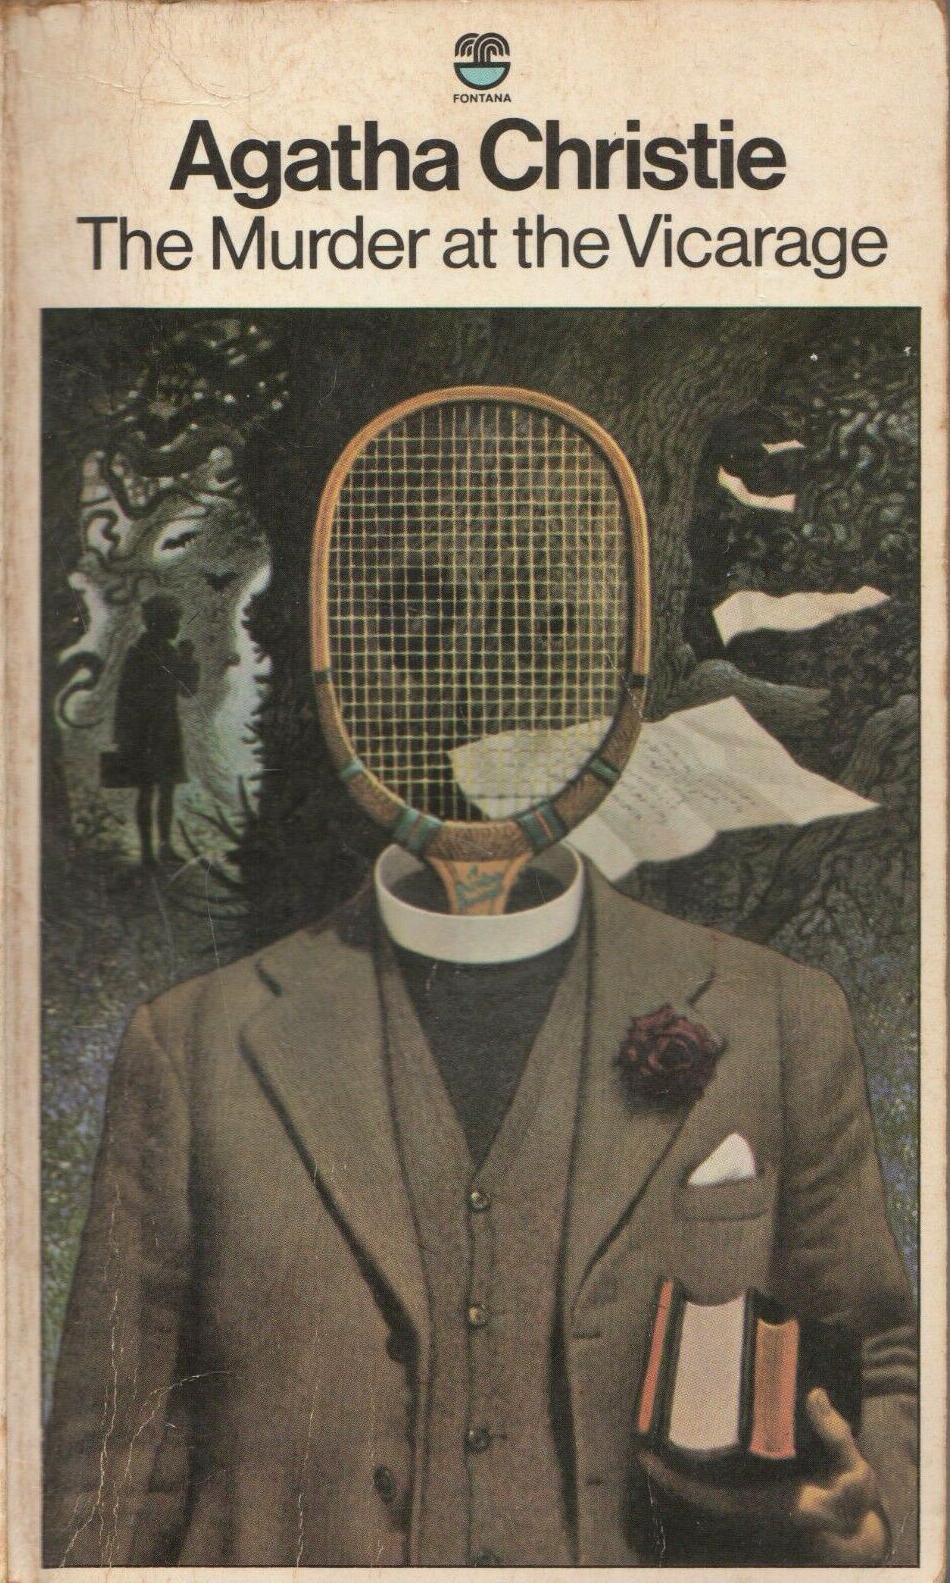 Agatha Christie Tom Adams The Murder at the Vicarage Fontana 1977